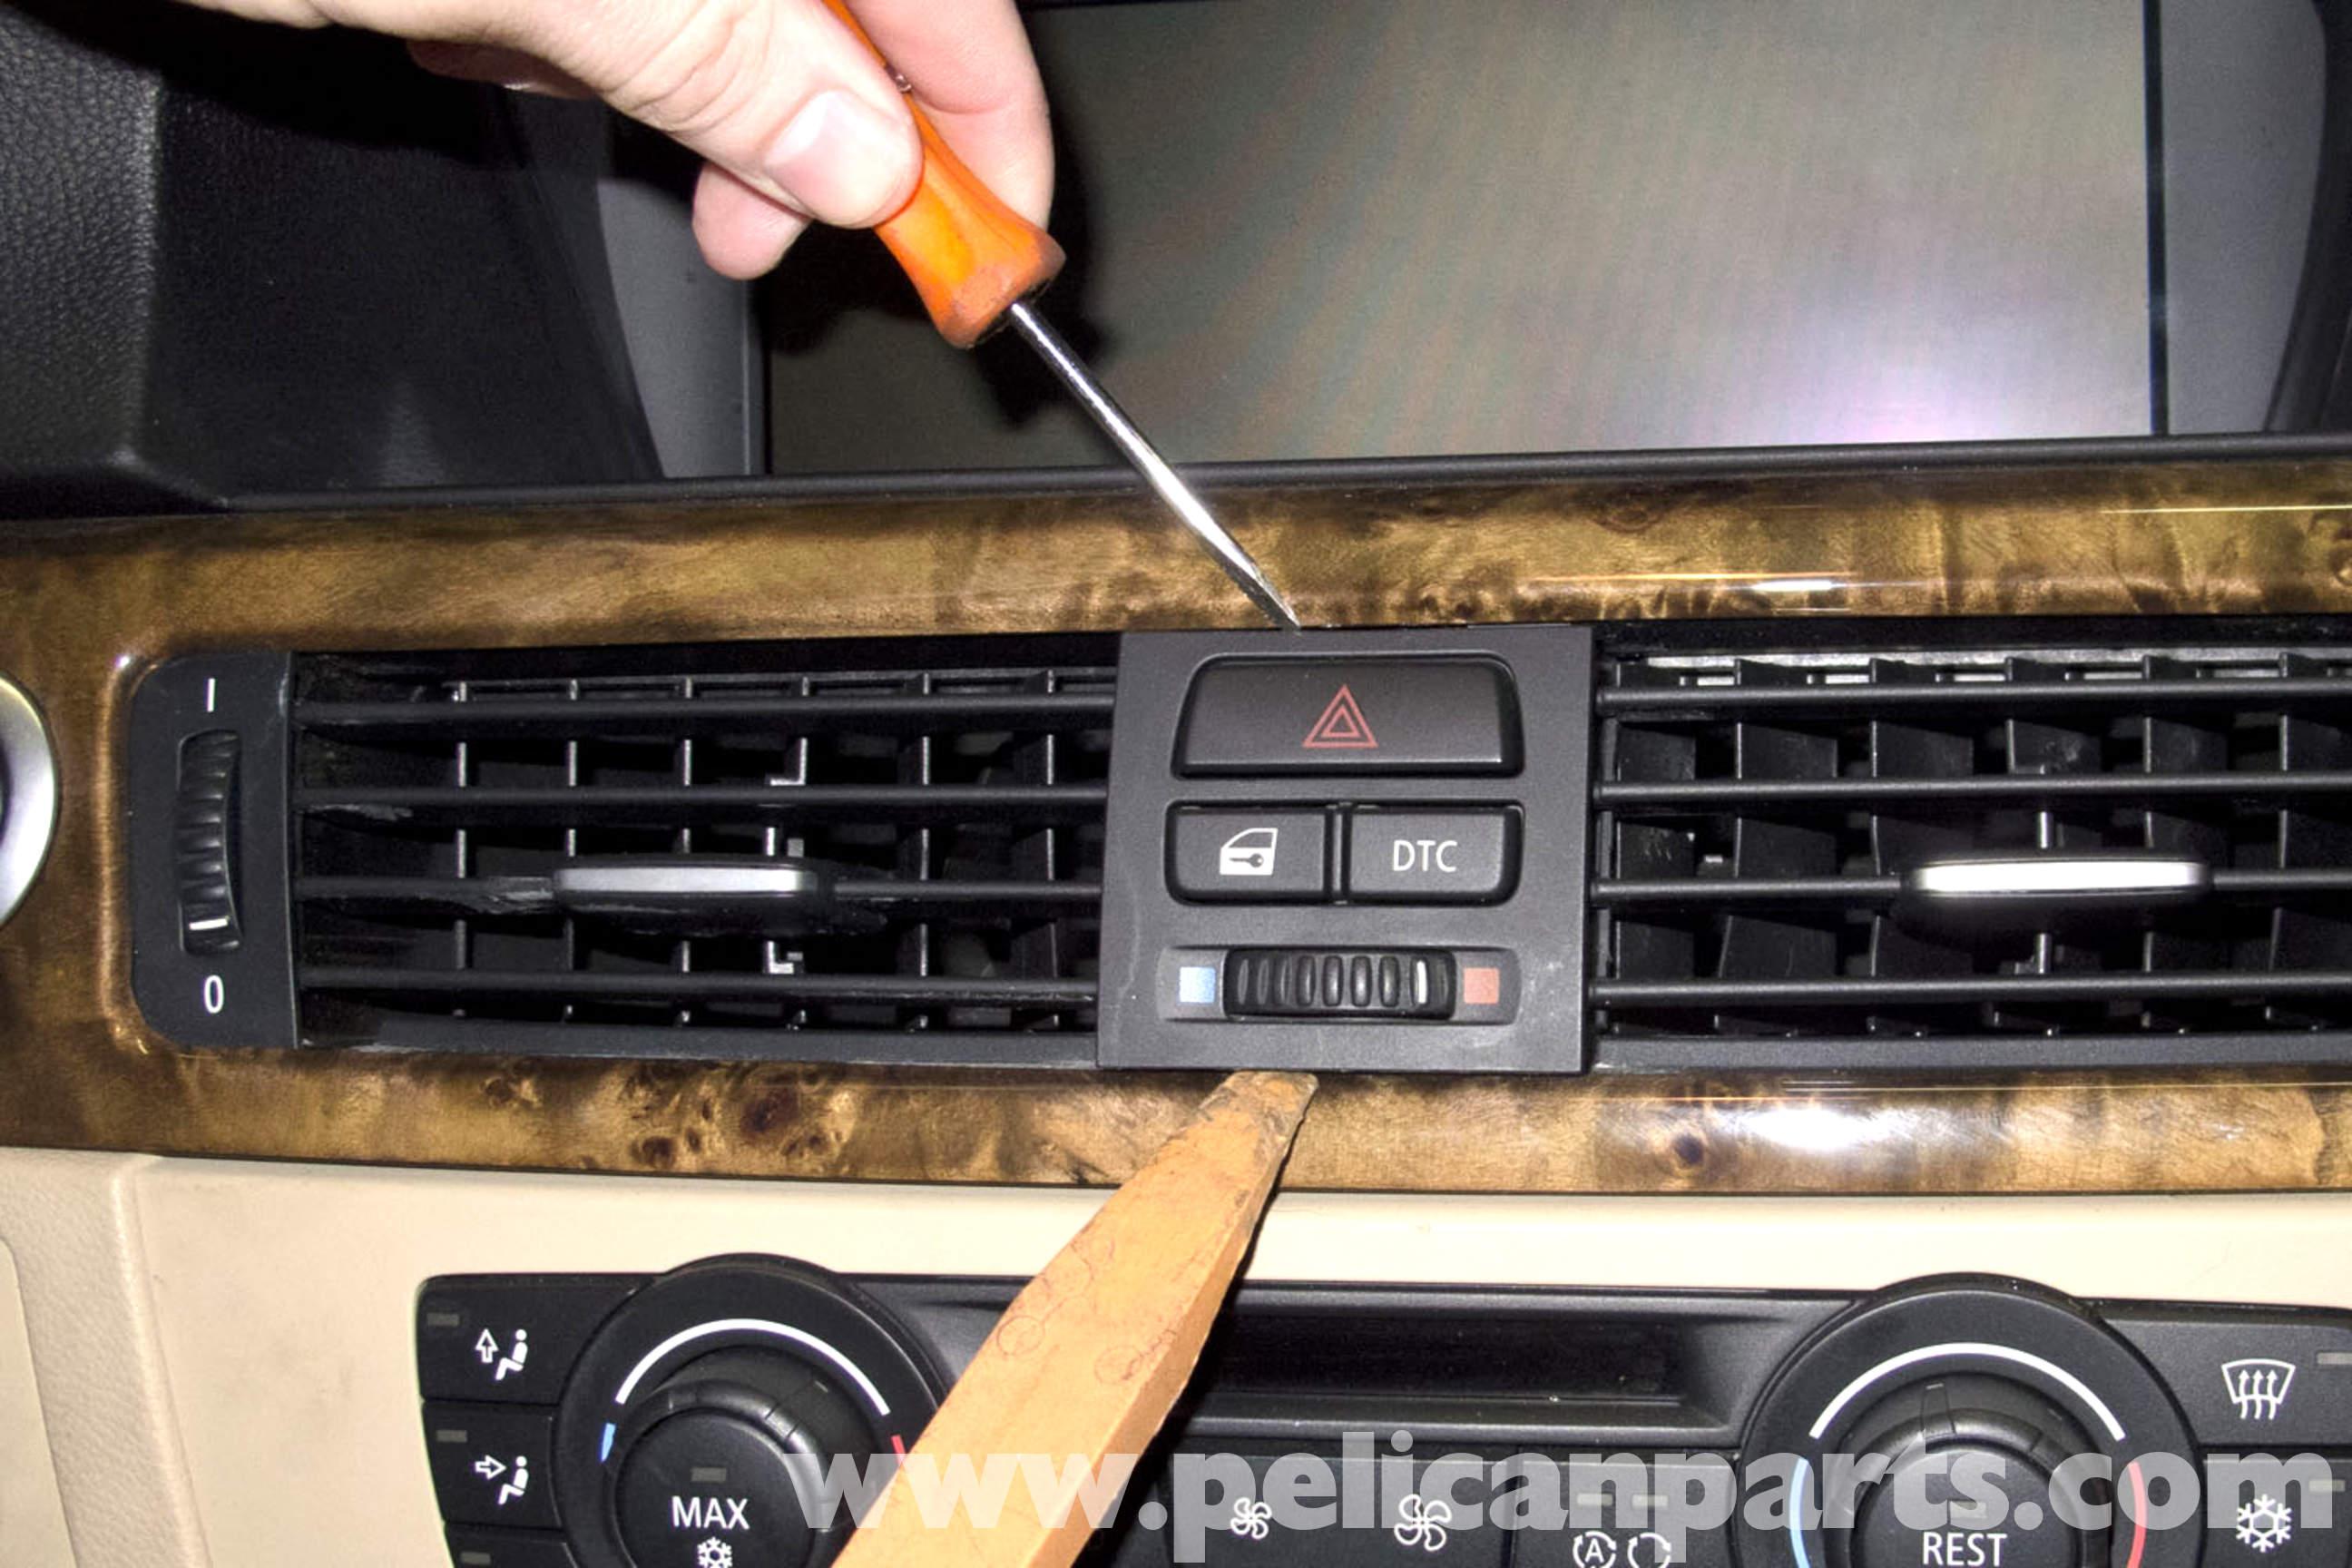 e90 bmw start stop wiring diagram    bmw       e90    radio ihka panel replacement e91  e92  e93     bmw       e90    radio ihka panel replacement e91  e92  e93